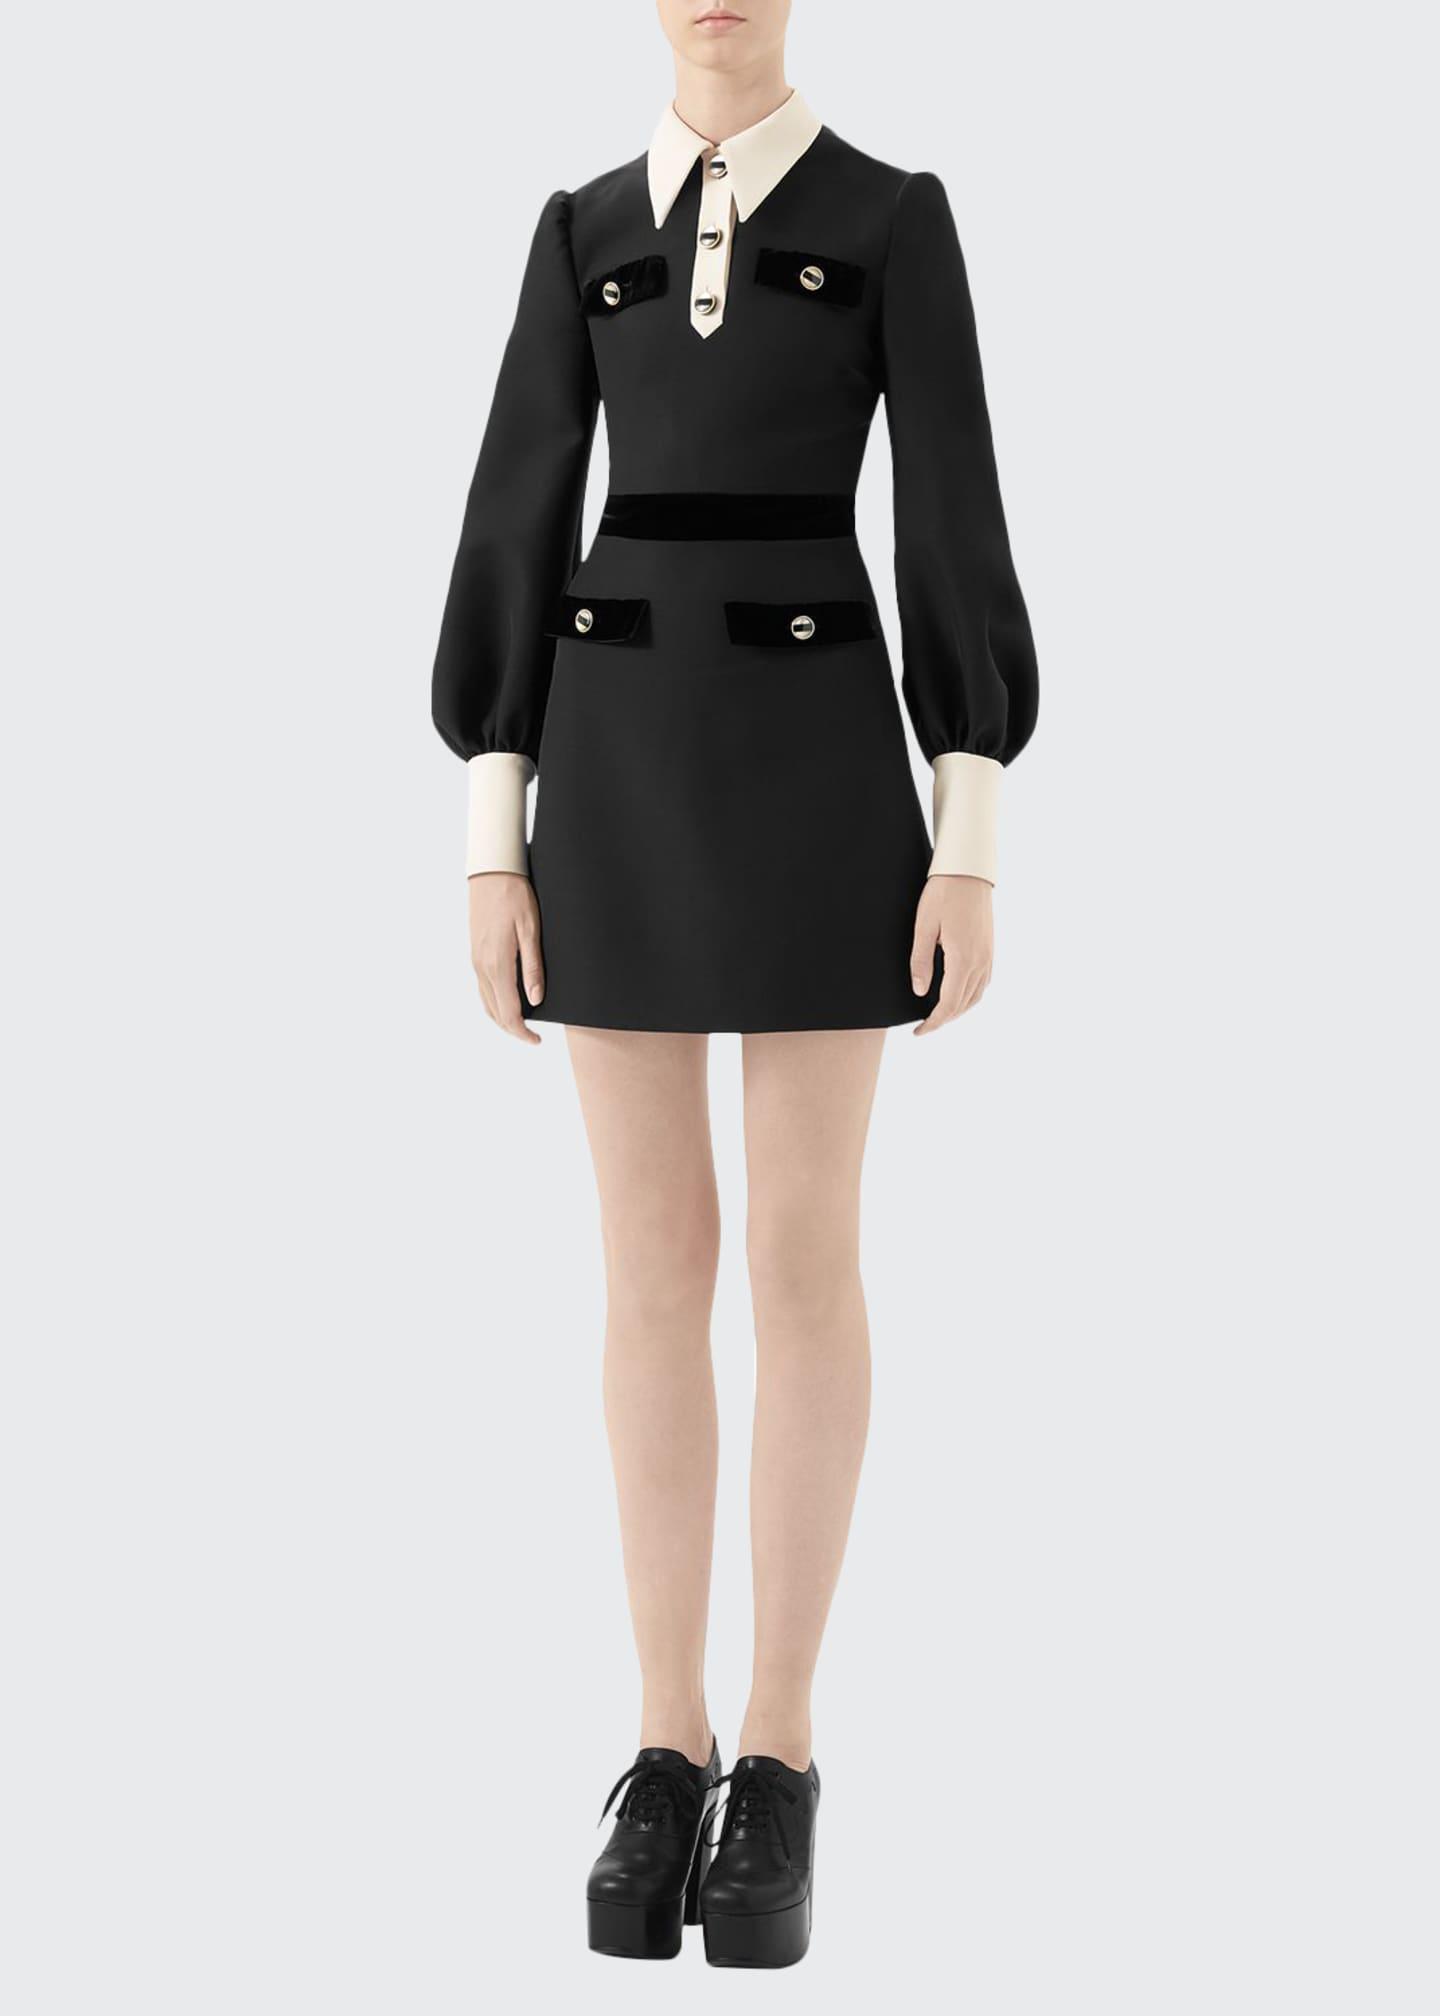 Gucci Cady Tie-Neck Dress